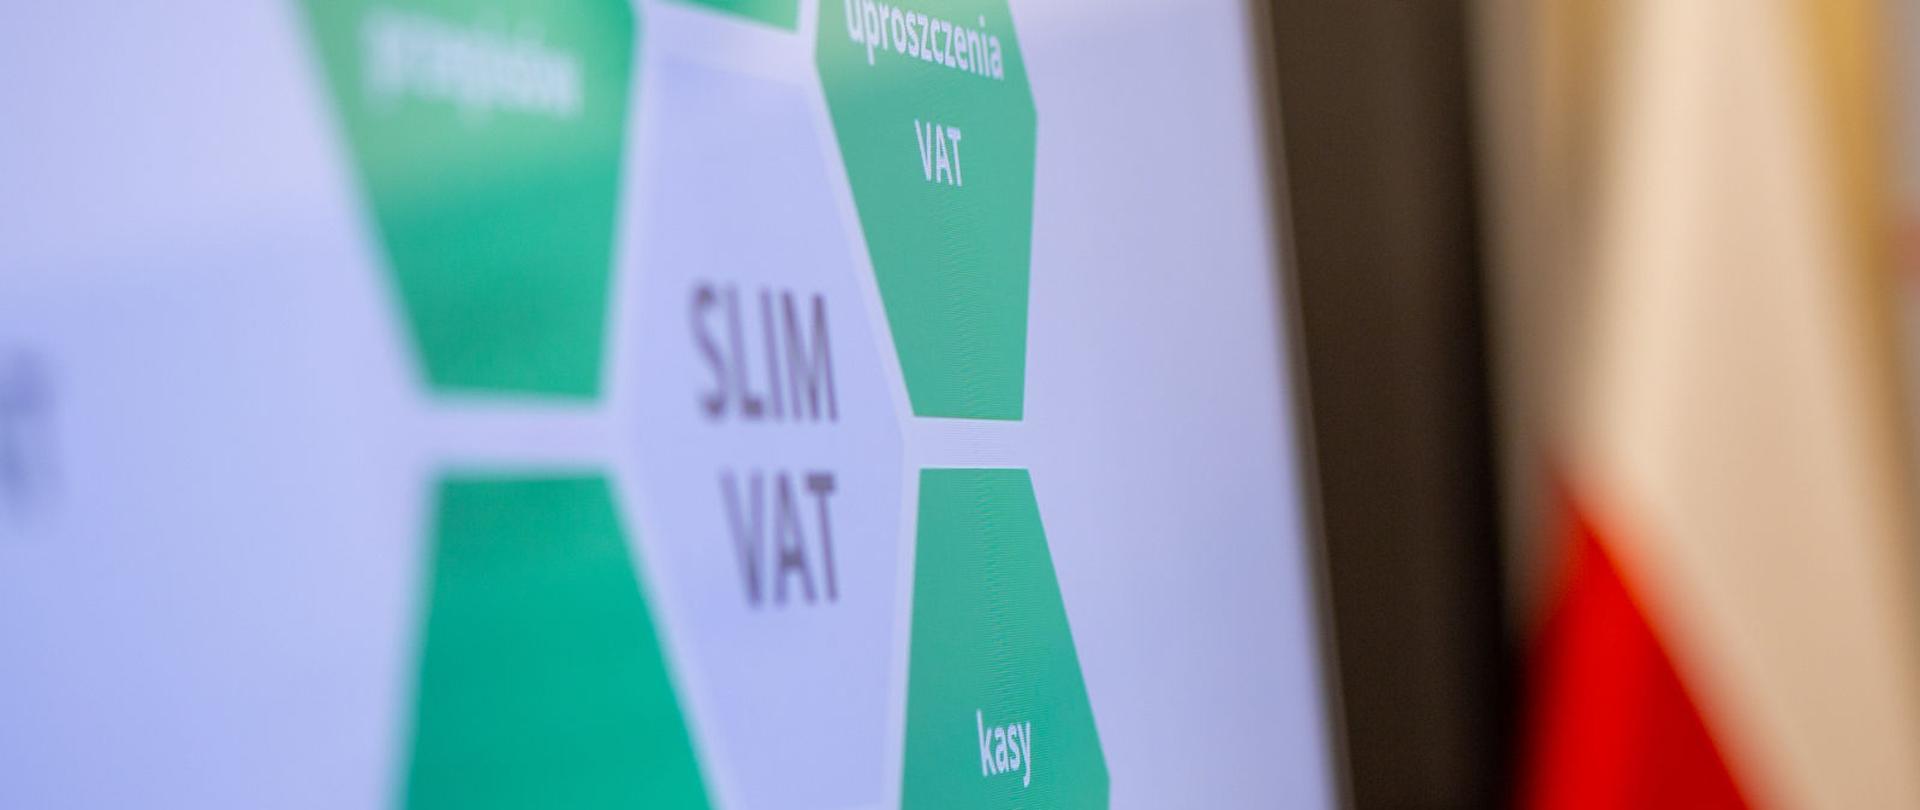 Slajd prezentacji z napisem SLIM VAT, uproszczenia VAT, kasy online.